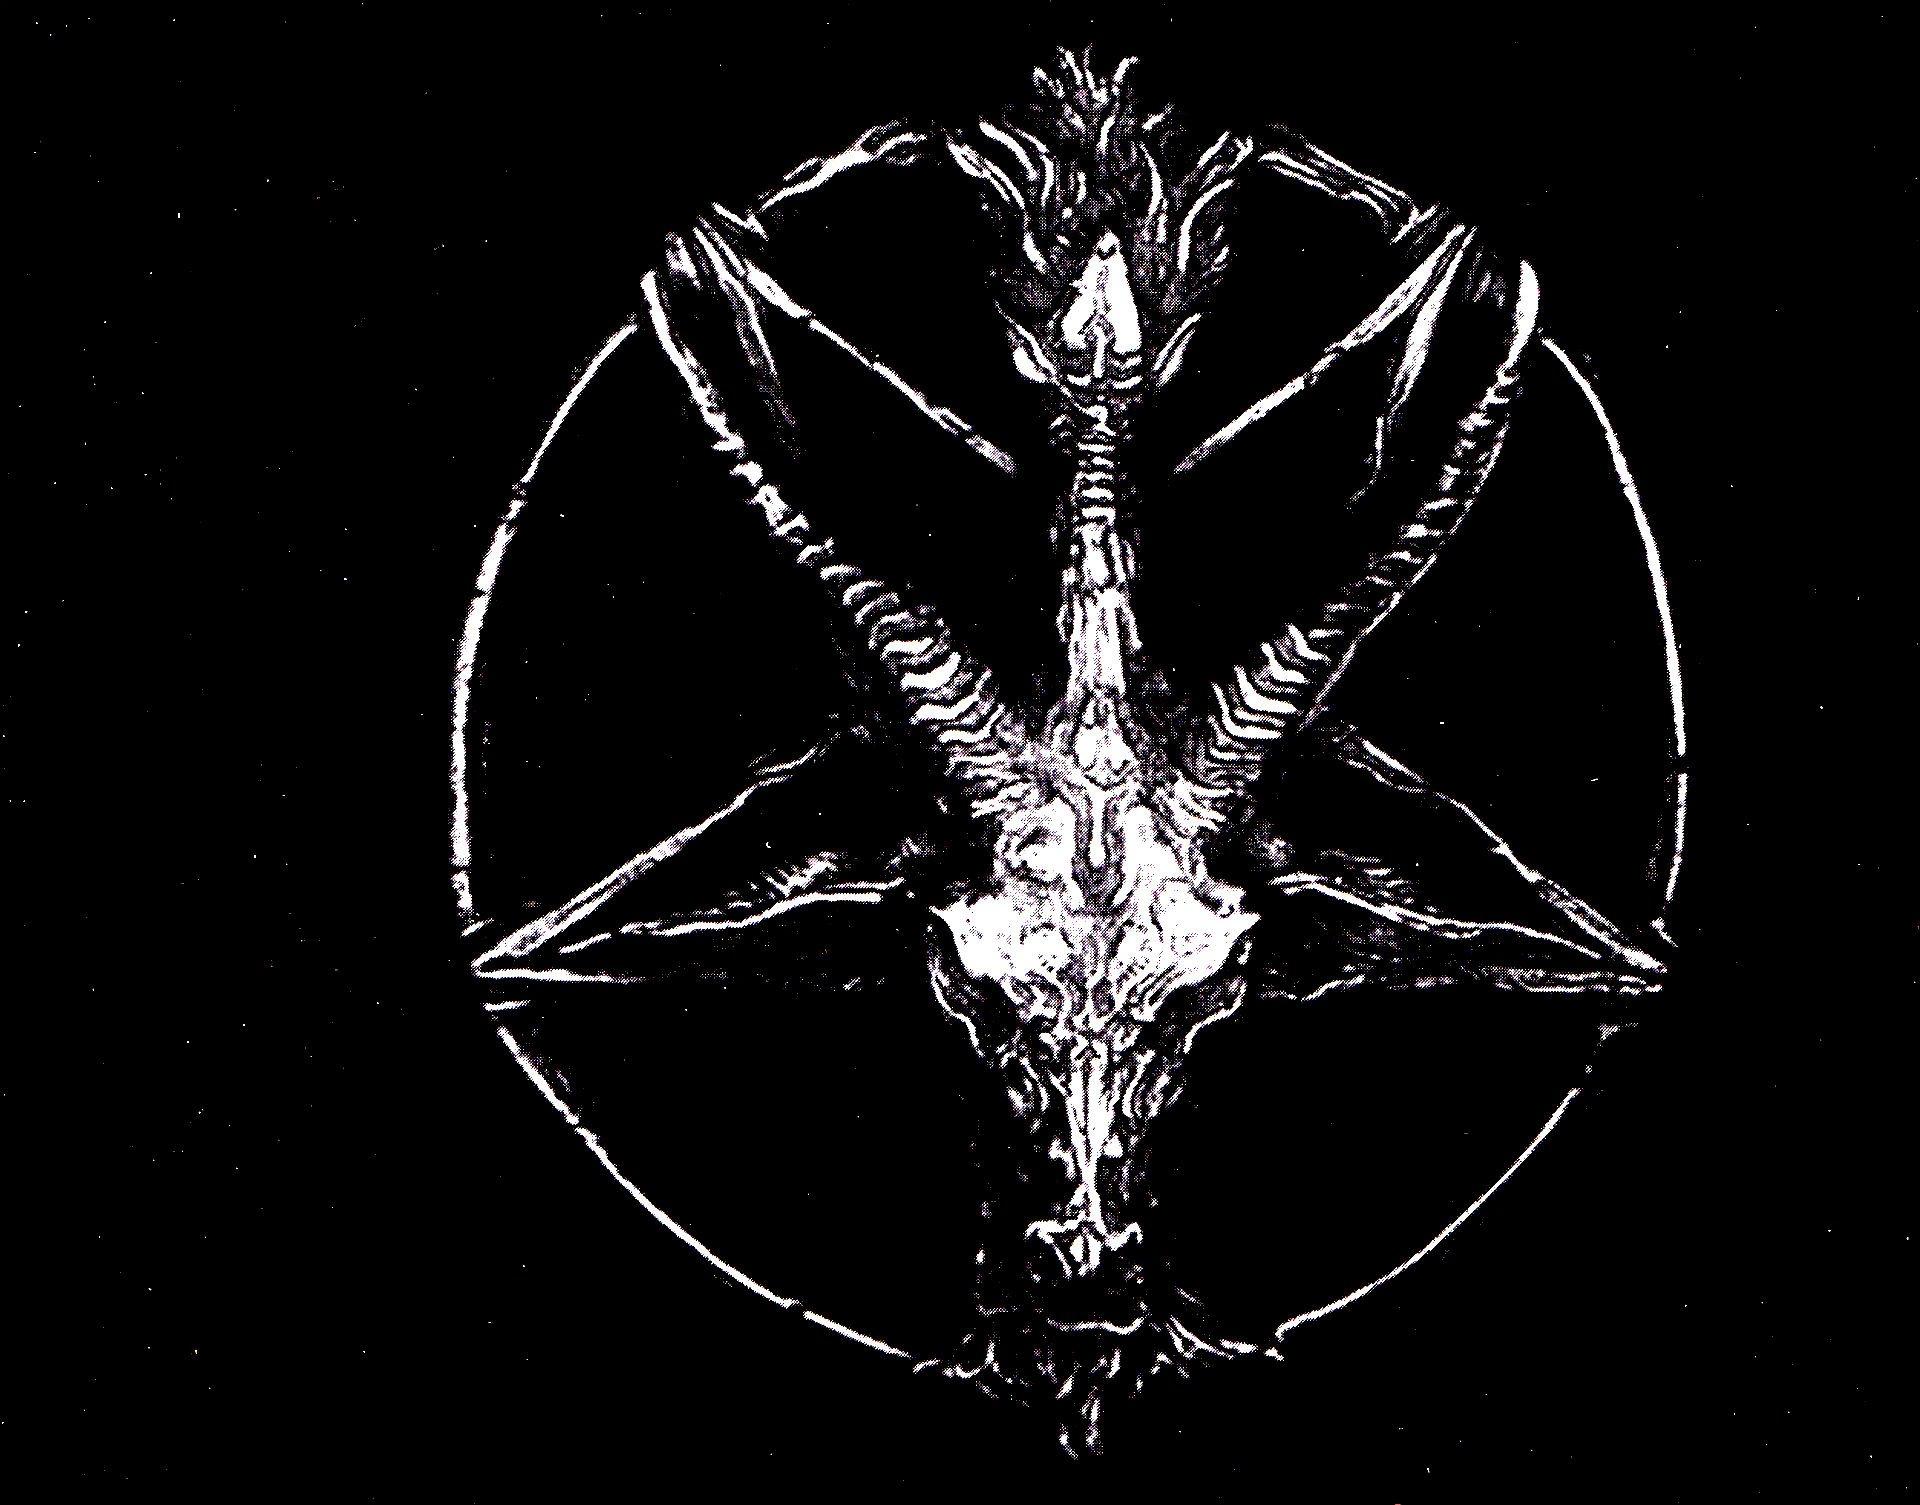 pentagram occult evil g wallpaper 1920x1505 329617 WallpaperUP 1920x1505